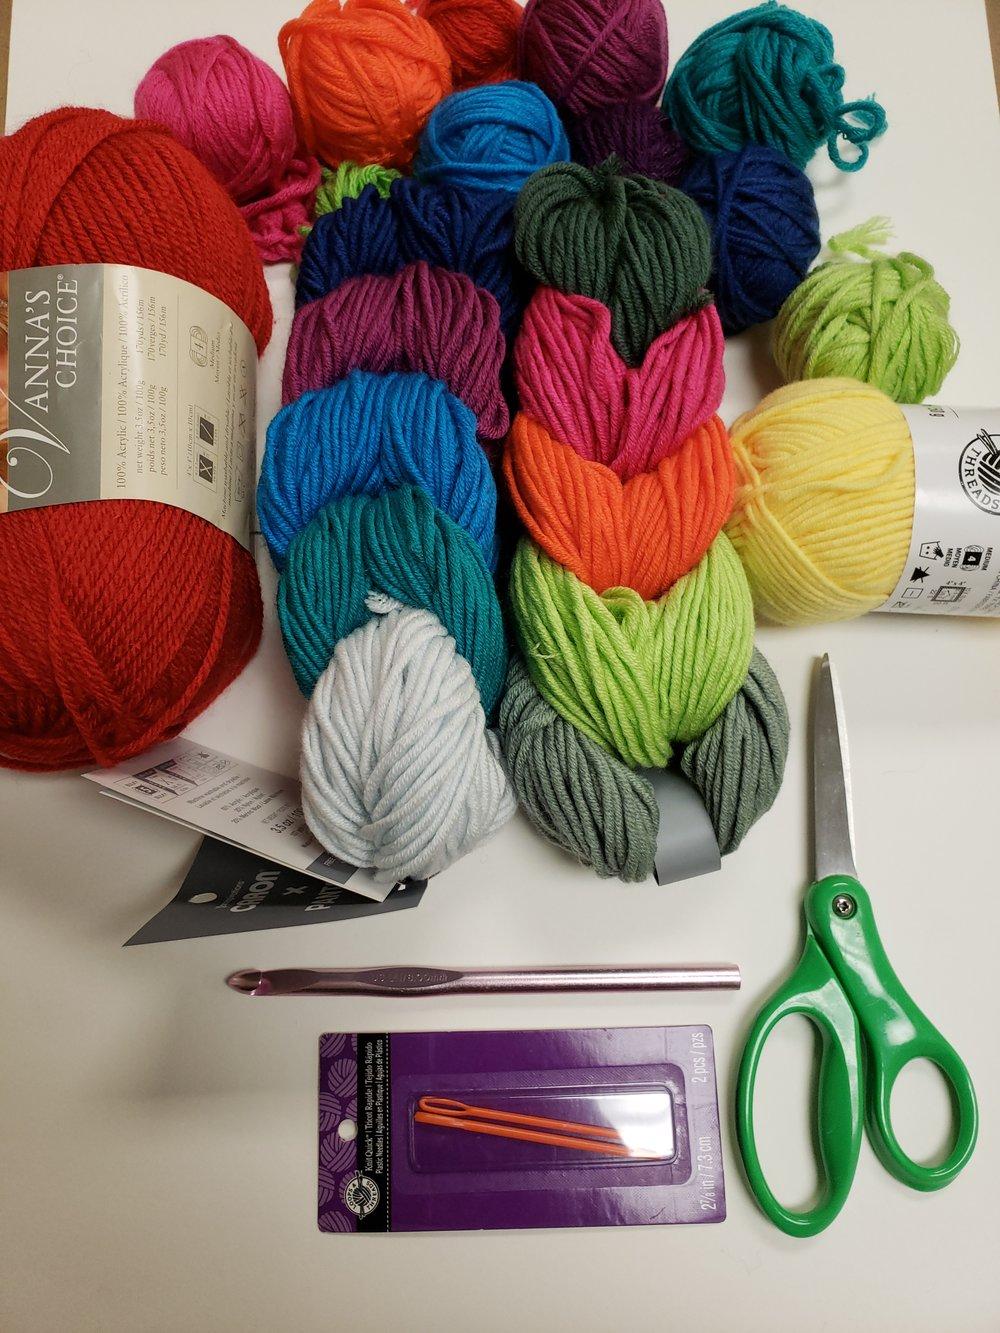 TSKC_DIY_Knitting.jpg